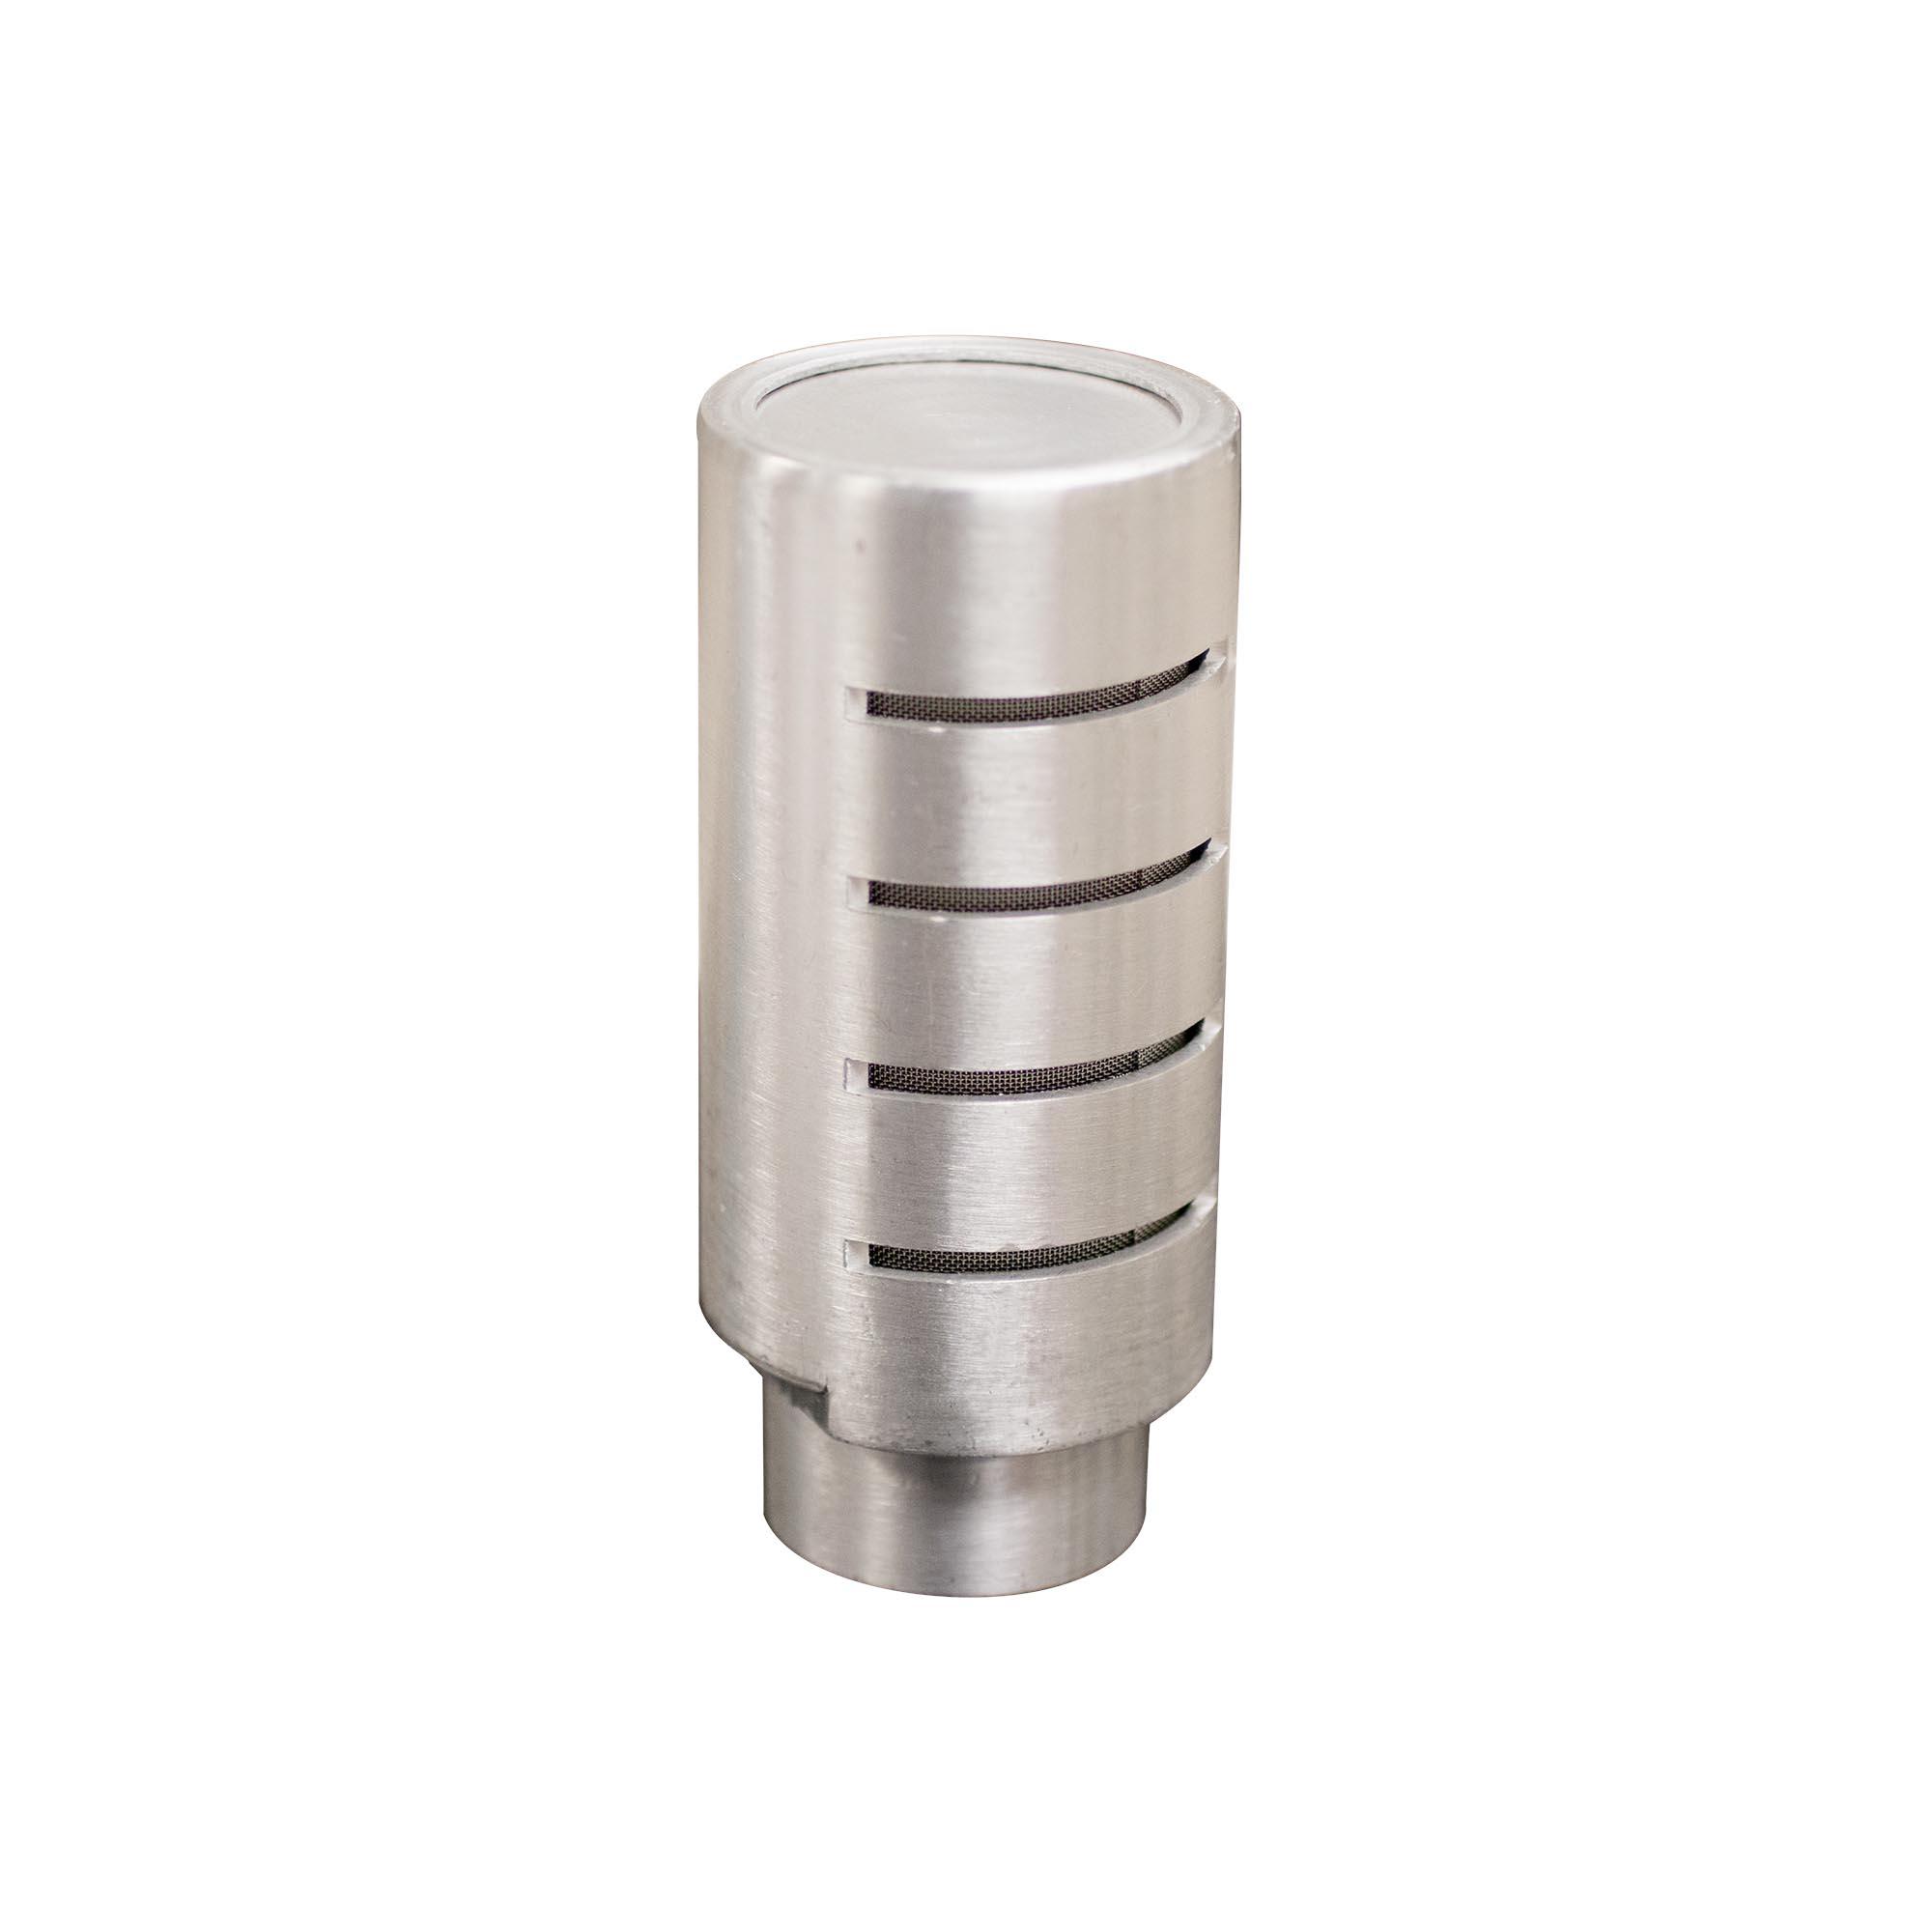 Model 3907 Hot Muffler for Large 50-150 SCFM Vortex Tubes